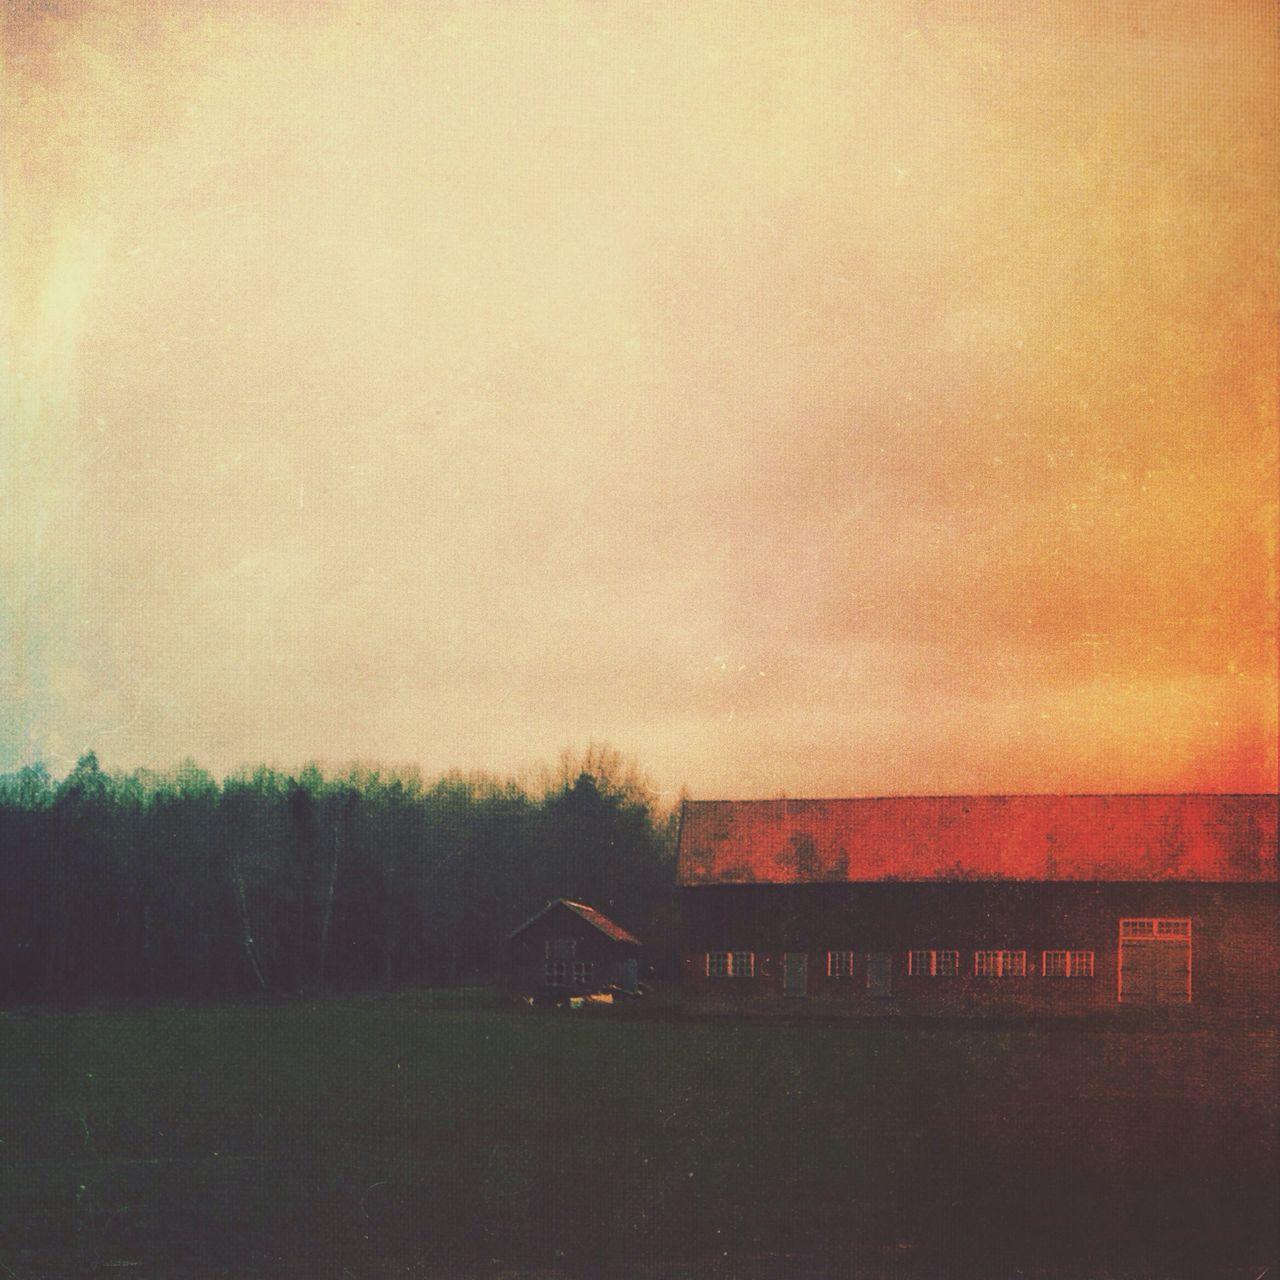 Countryroad EyeEm Best Shots Edited Barn Countryside EyeEm Nature Lover